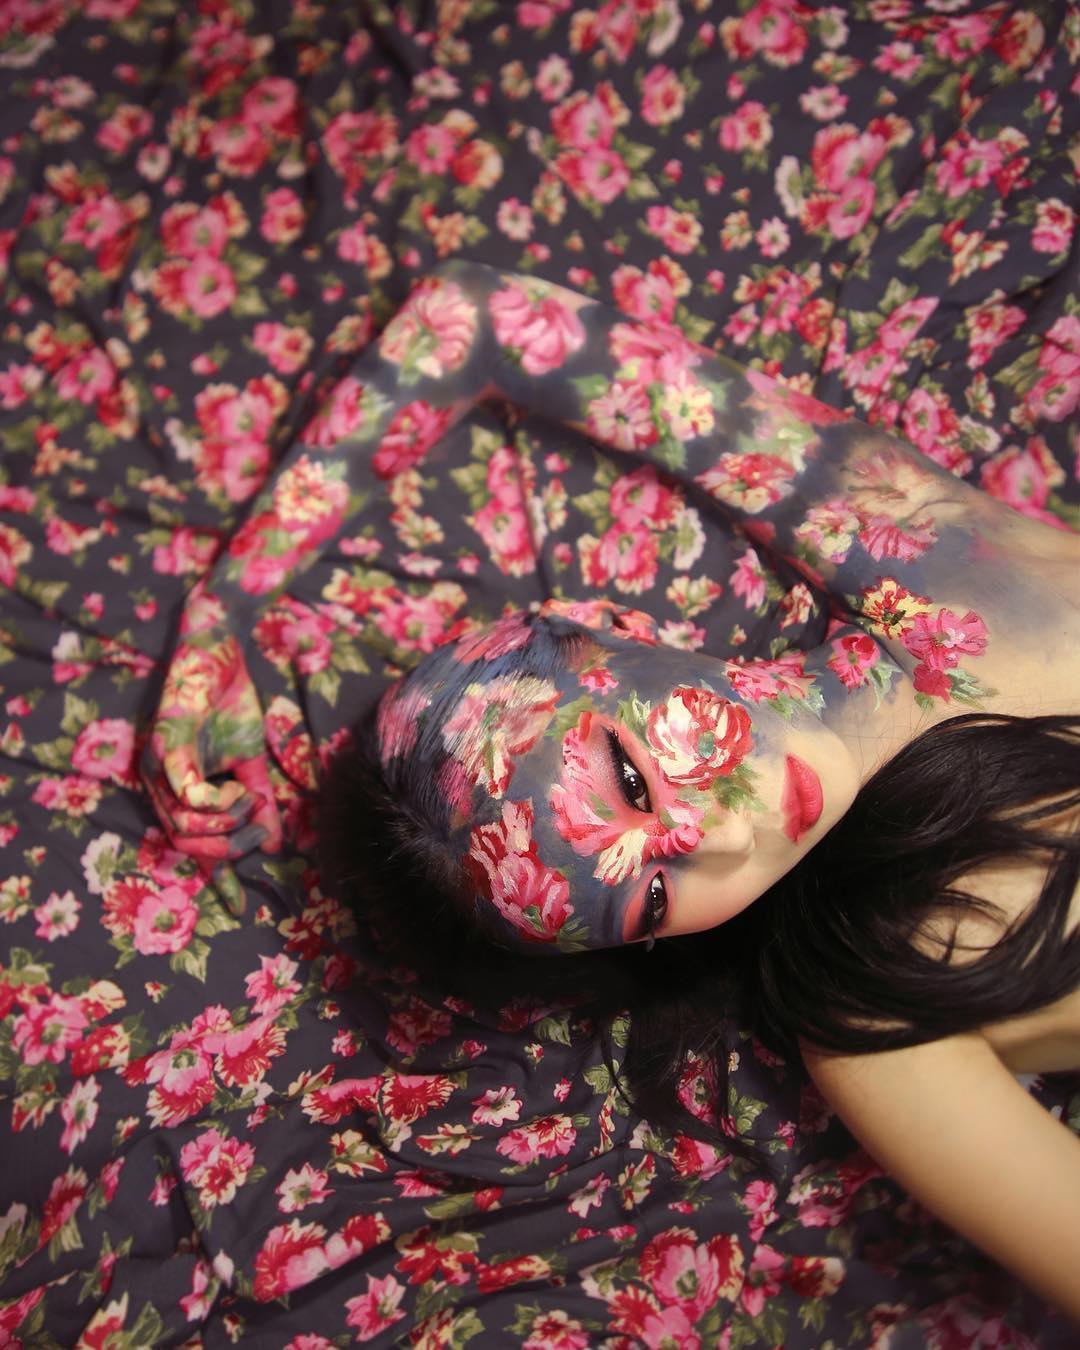 dain-yoon-art-12-1557519347541.jpg